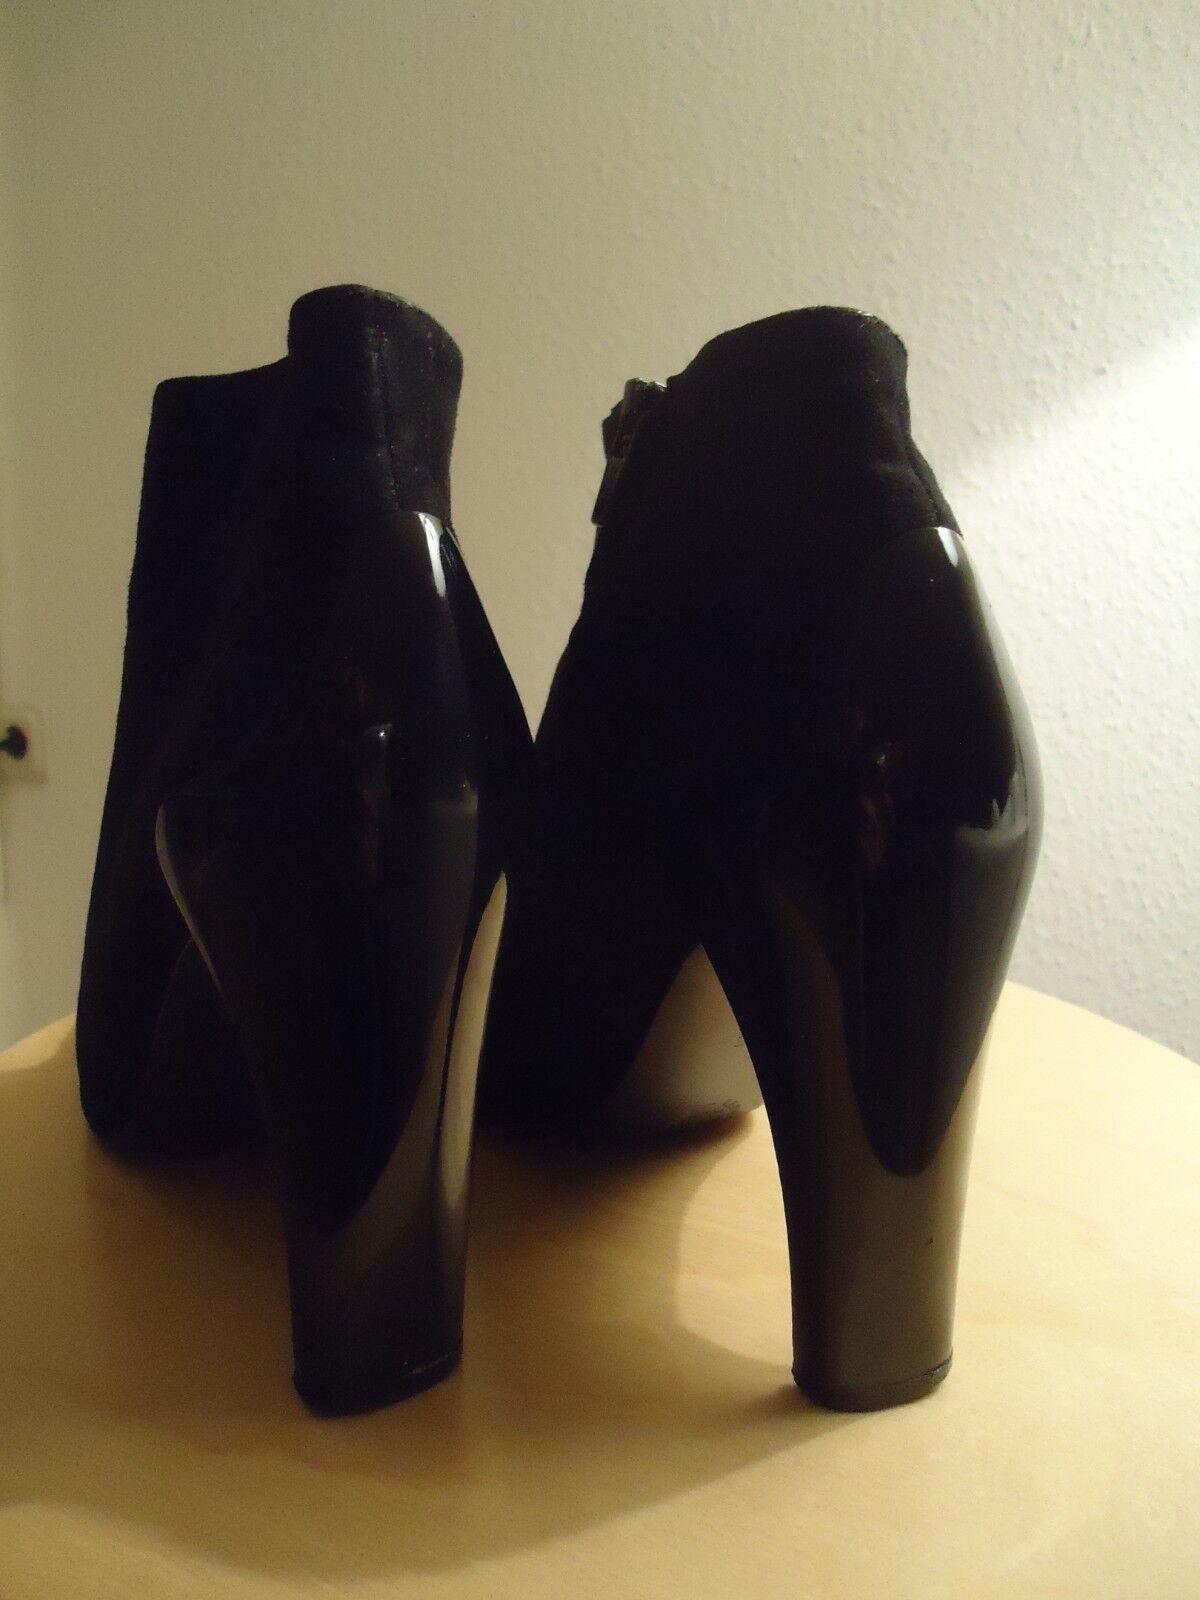 Stephane Kélian Stifeletten Stiefel Stiefel Stiefel Wildleder Schwarz Booits schwarz c8dcd3